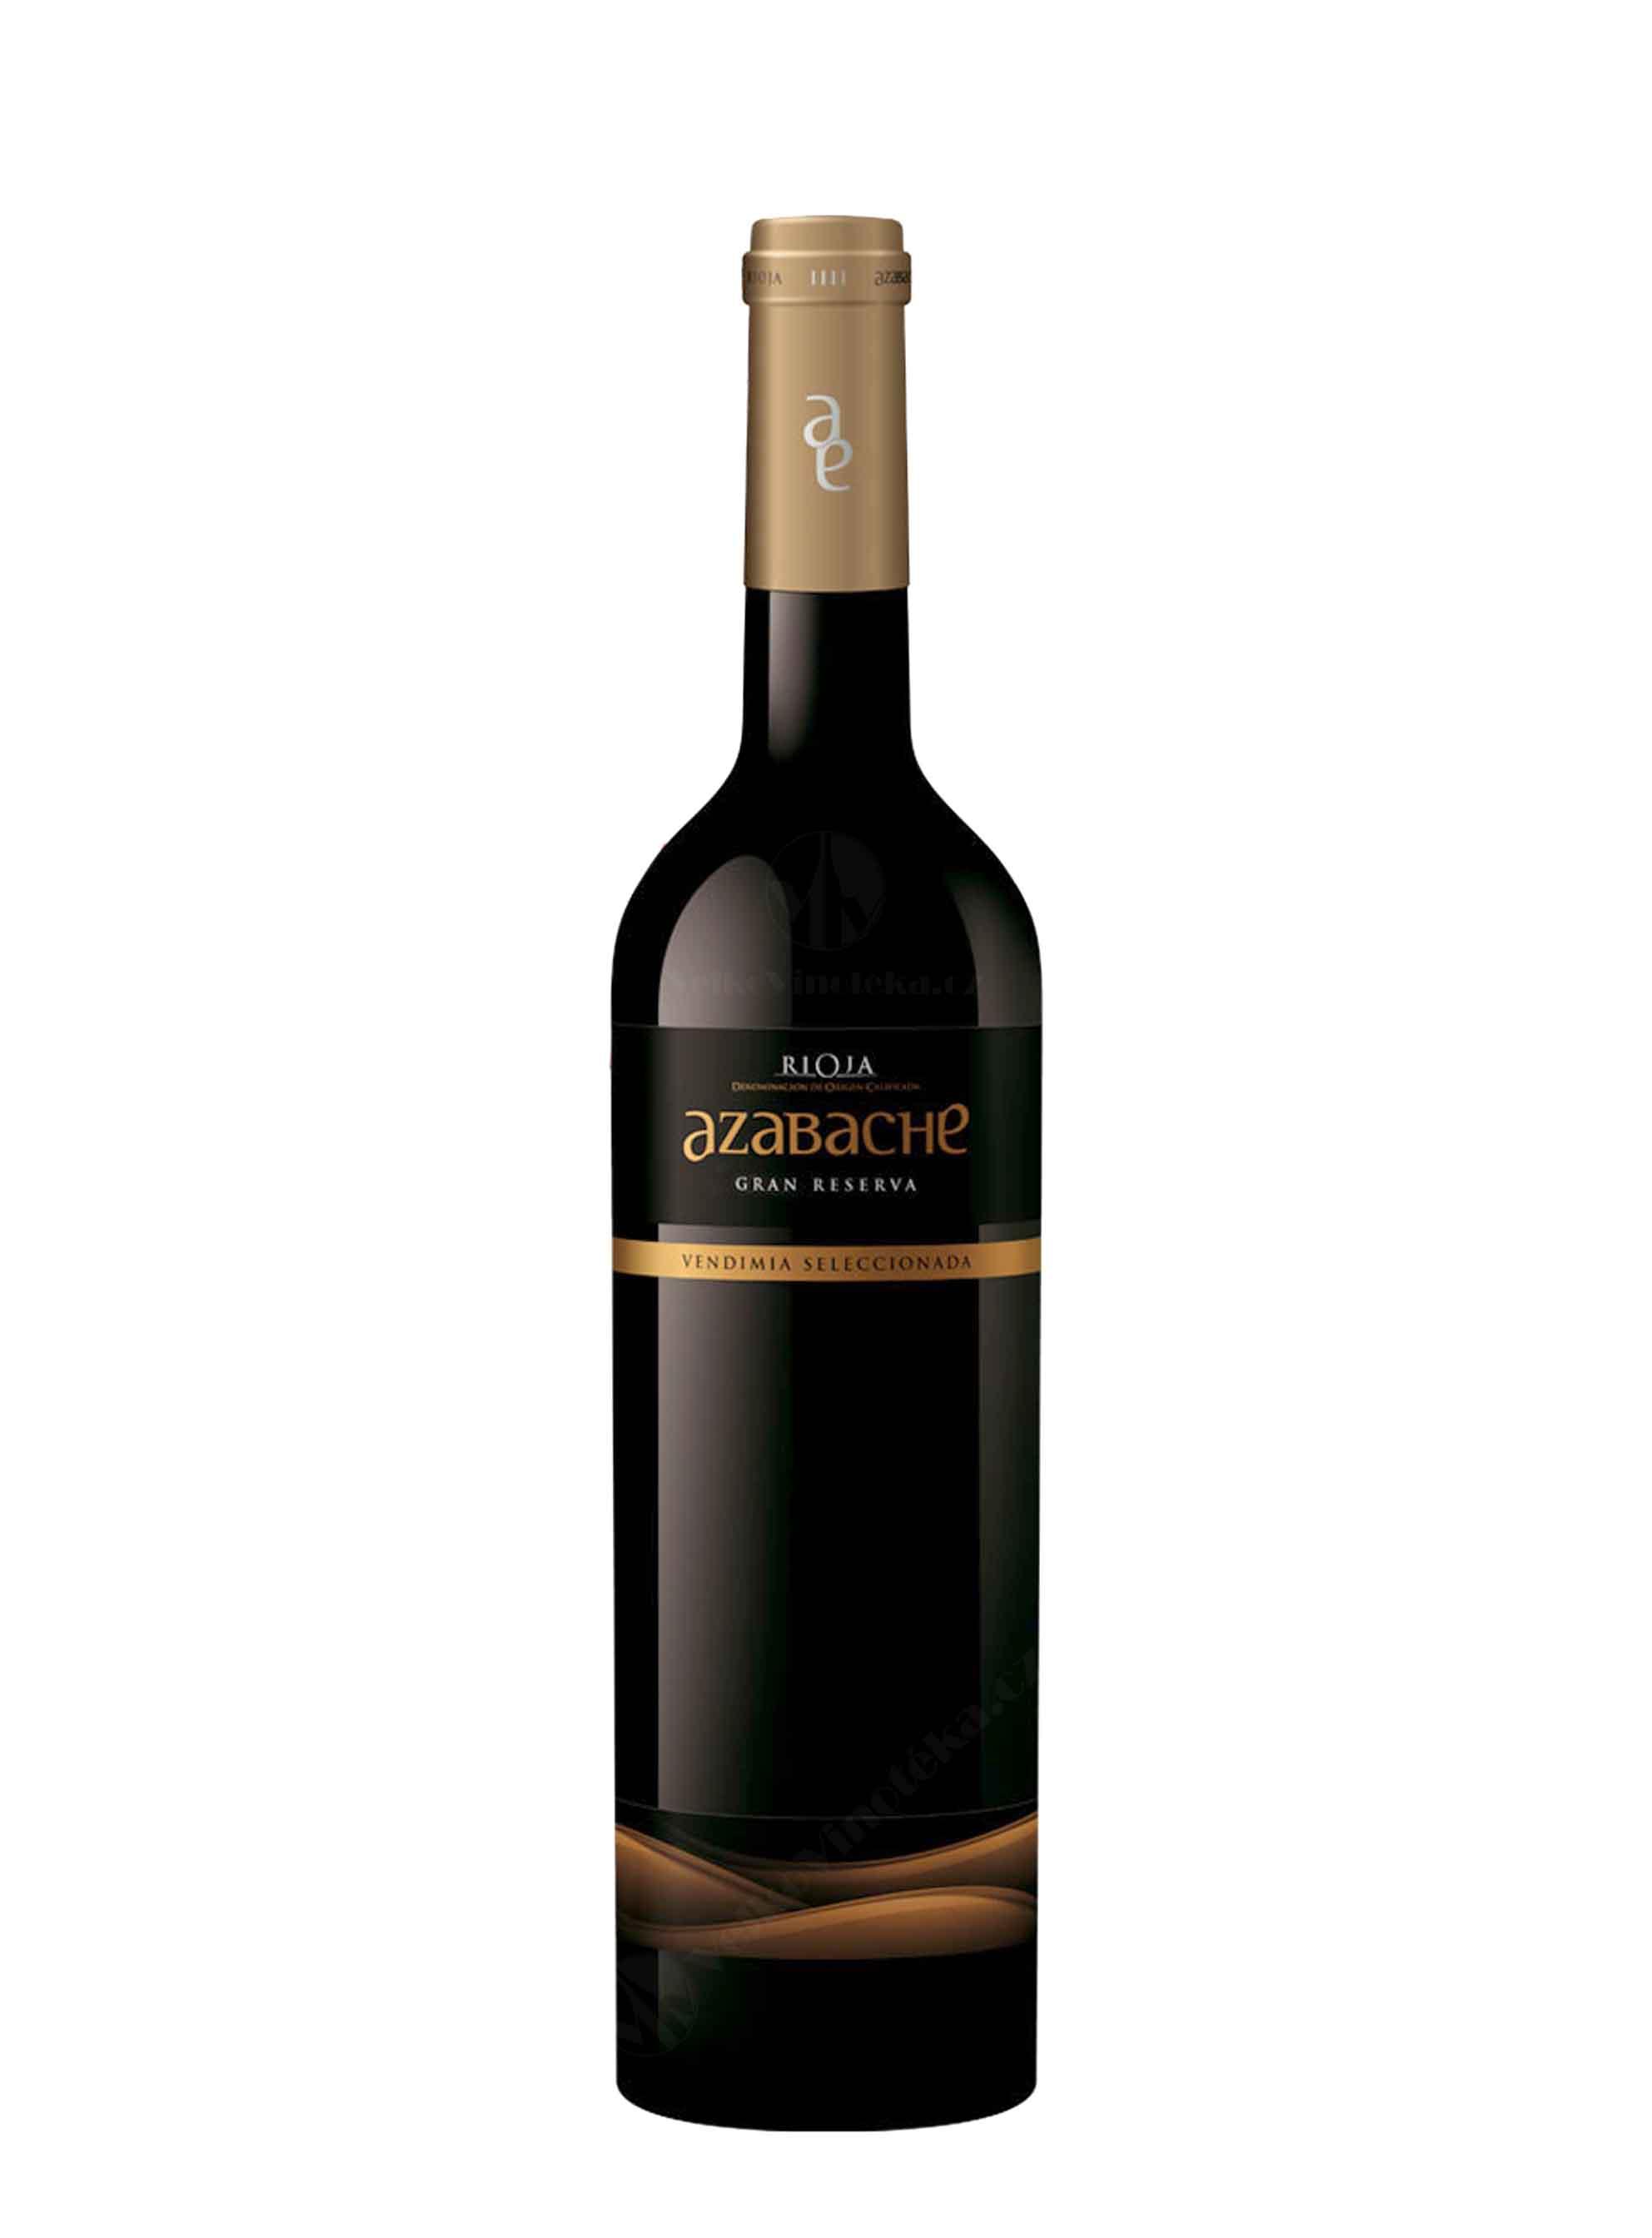 Cuvée, Azabache, DOCa Gran Reserva, 2006, Vinedos de Aldeanueva, 0.75 l